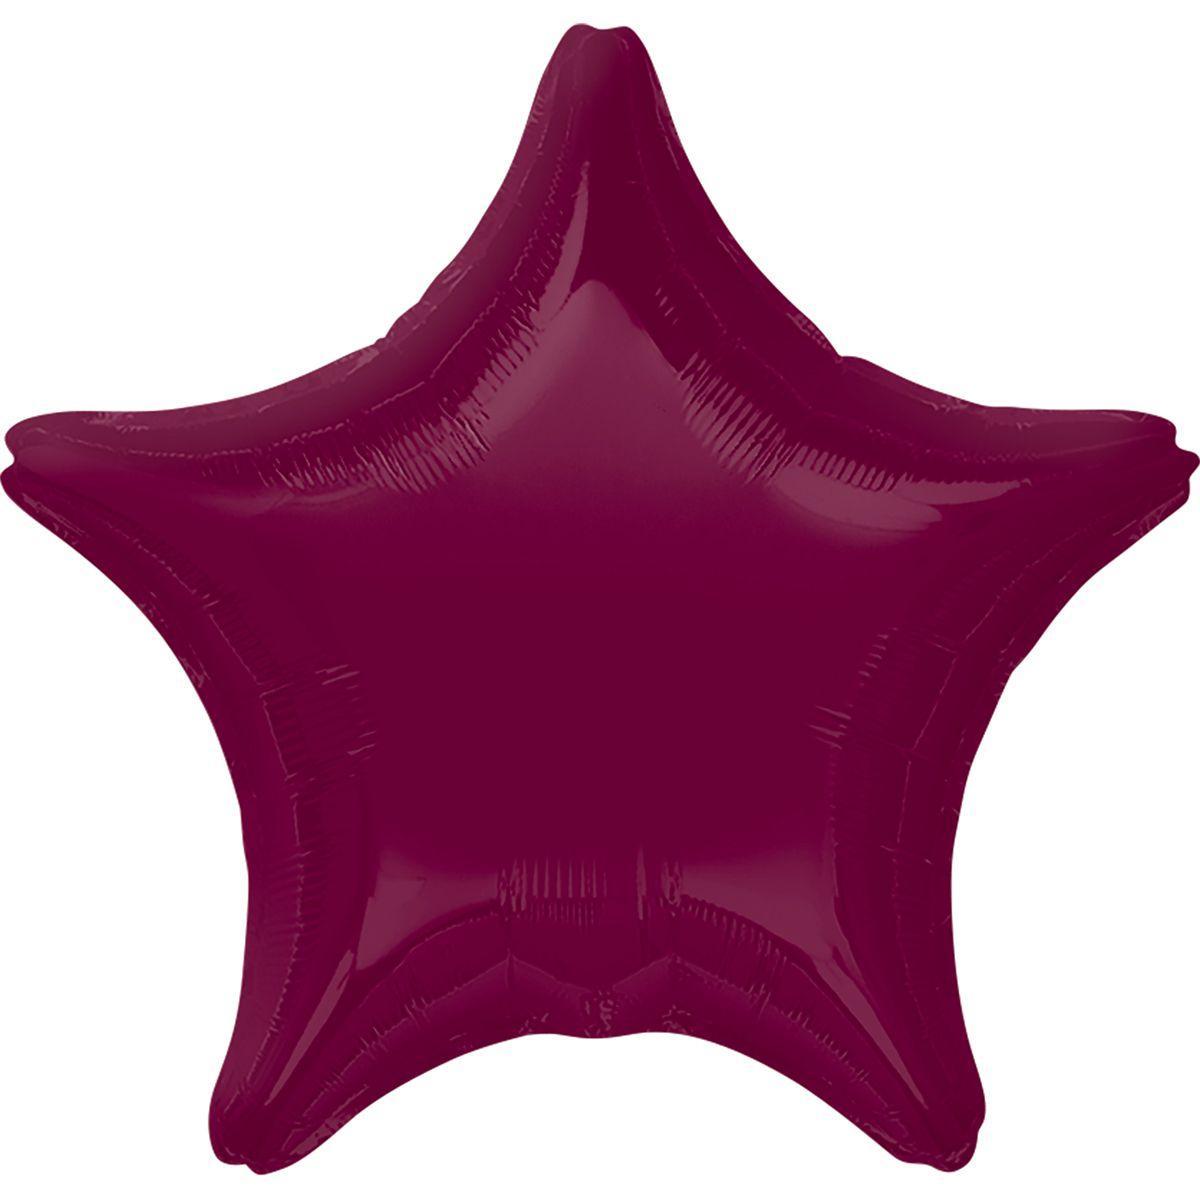 "Фол куля Anagram 18""/45см ЗІРКА металік Berry ягідний (Анаграм)"